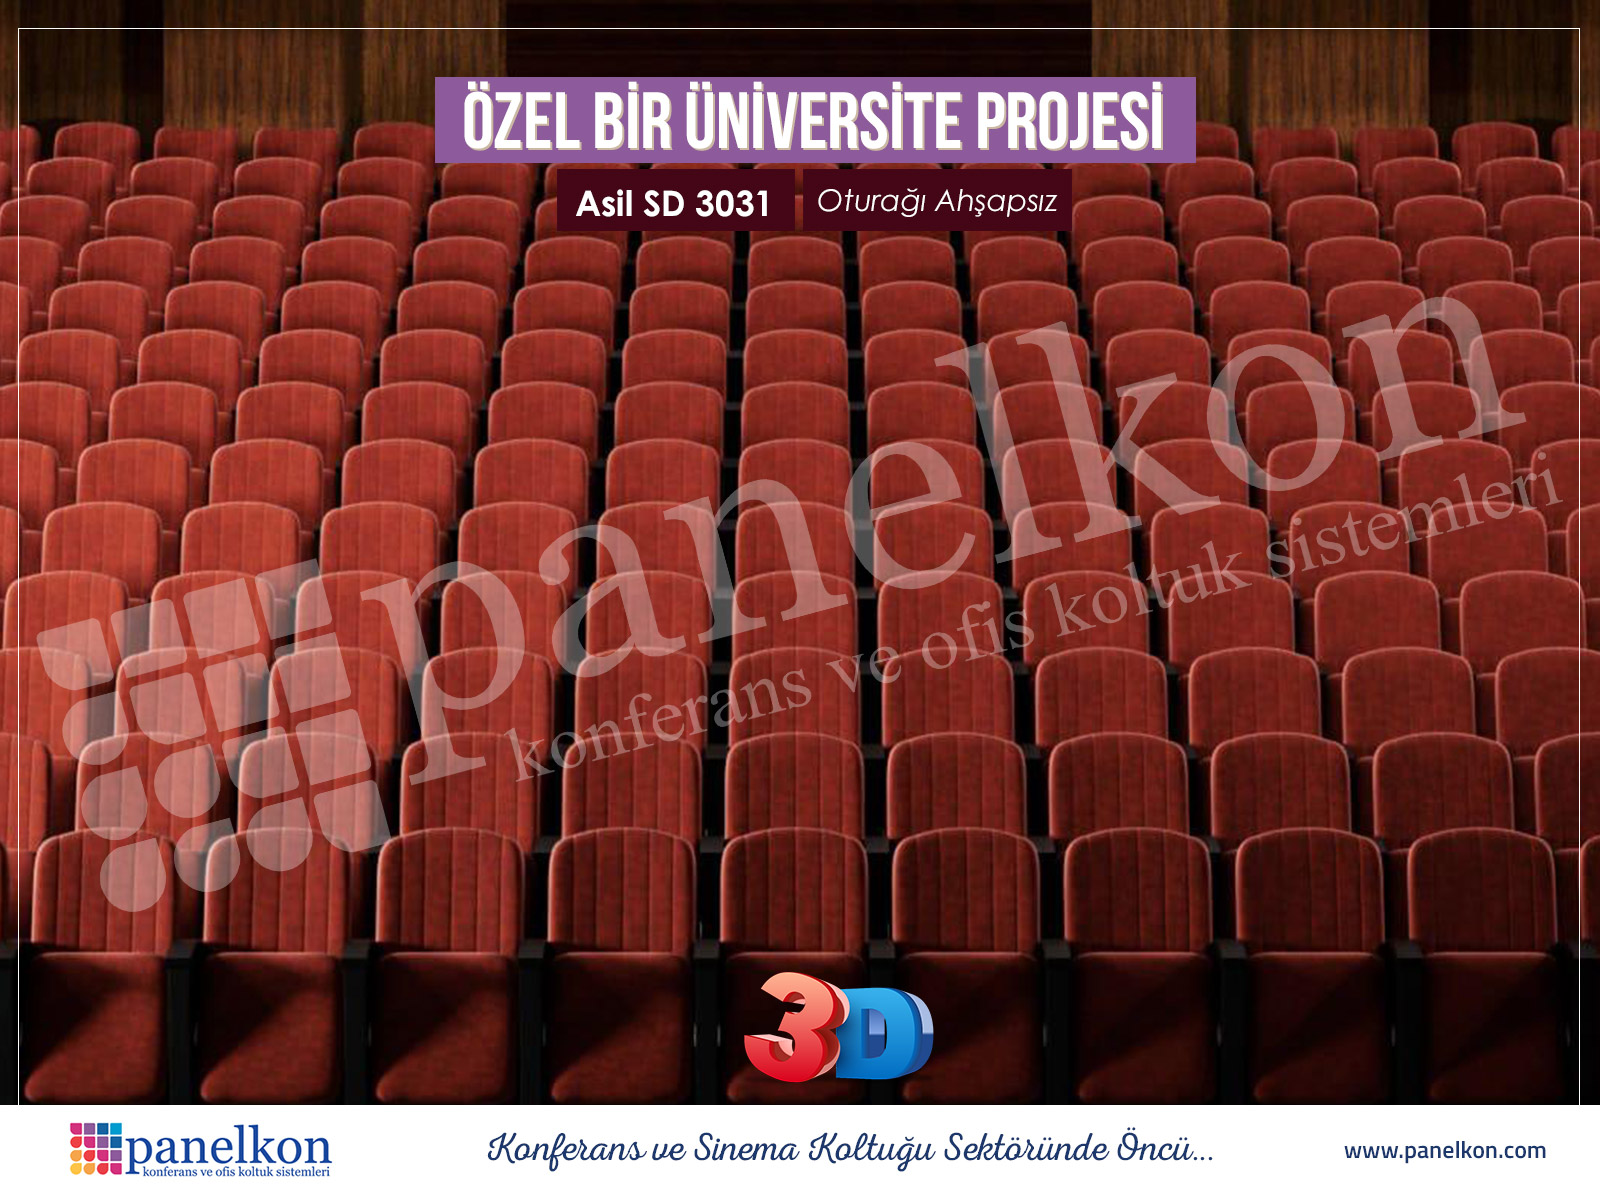 universite-konferans-koltugu-1